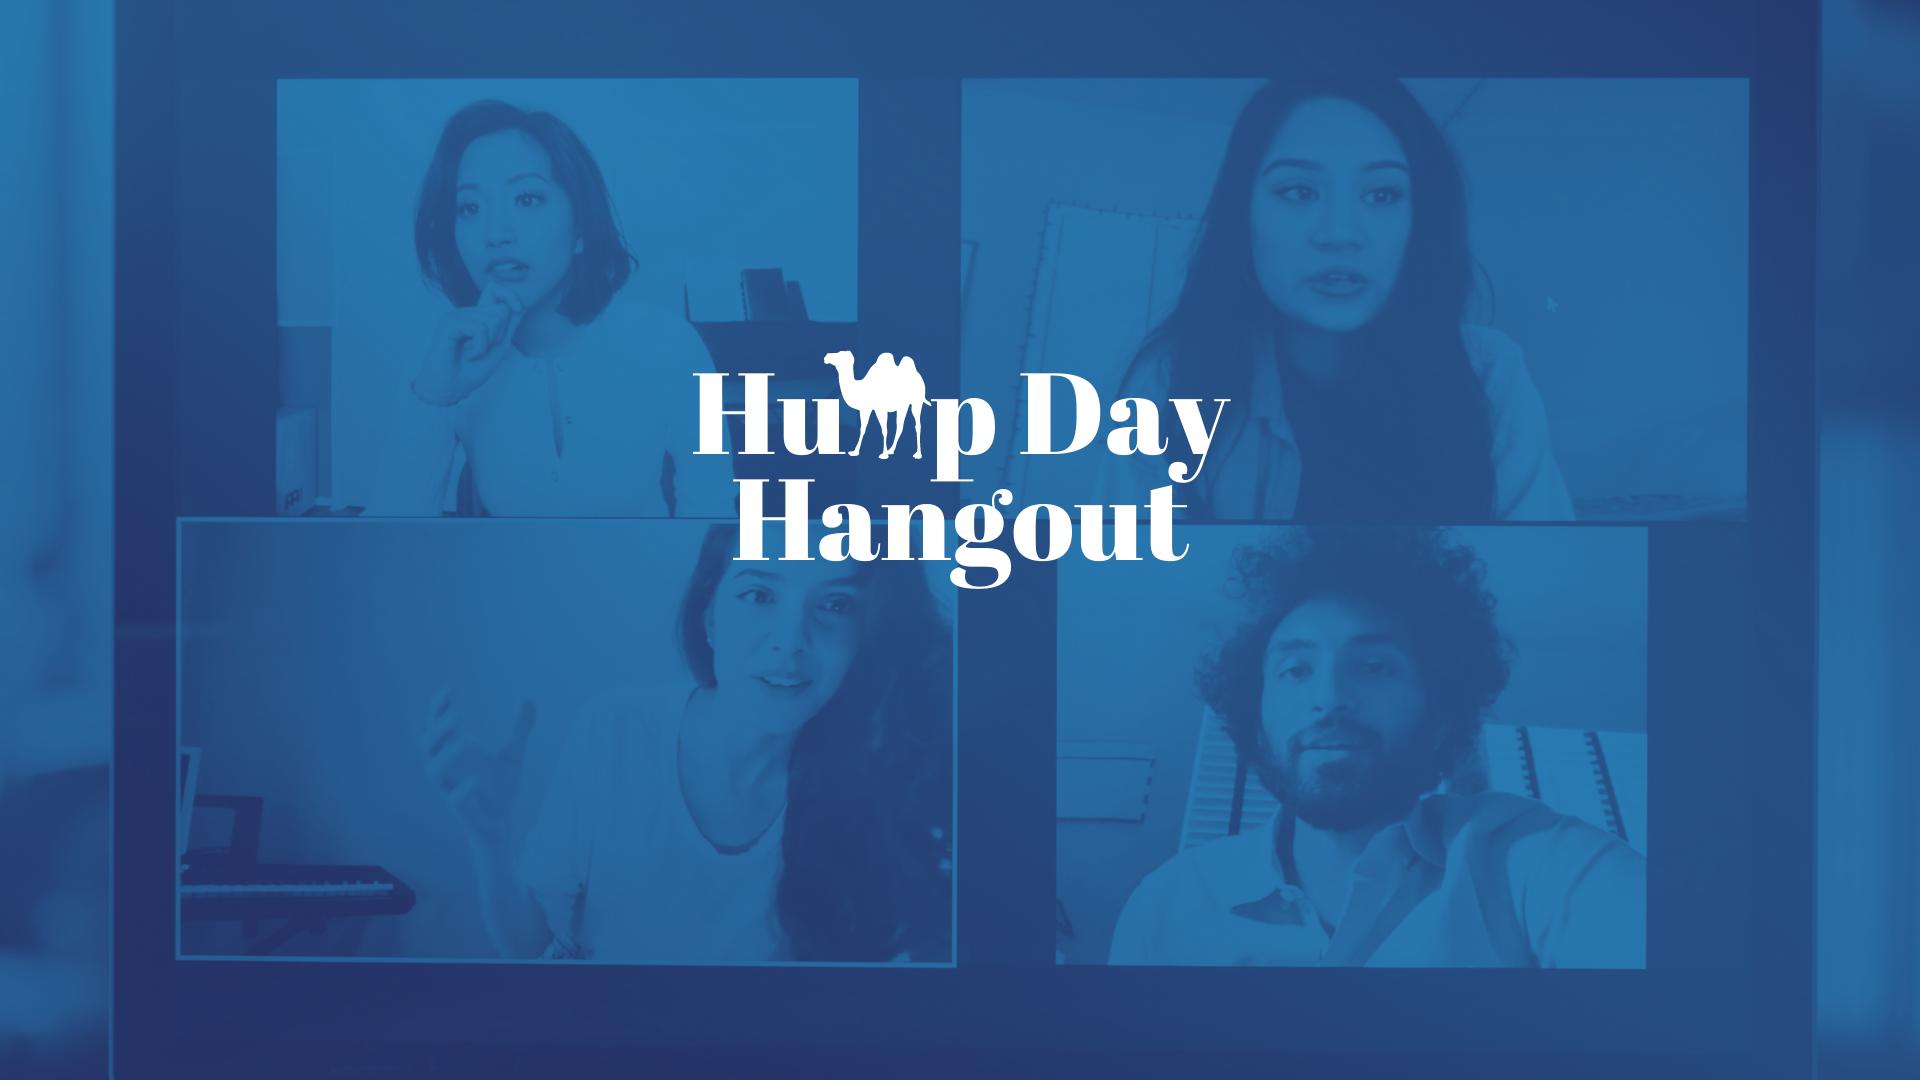 Hump Day Hangout